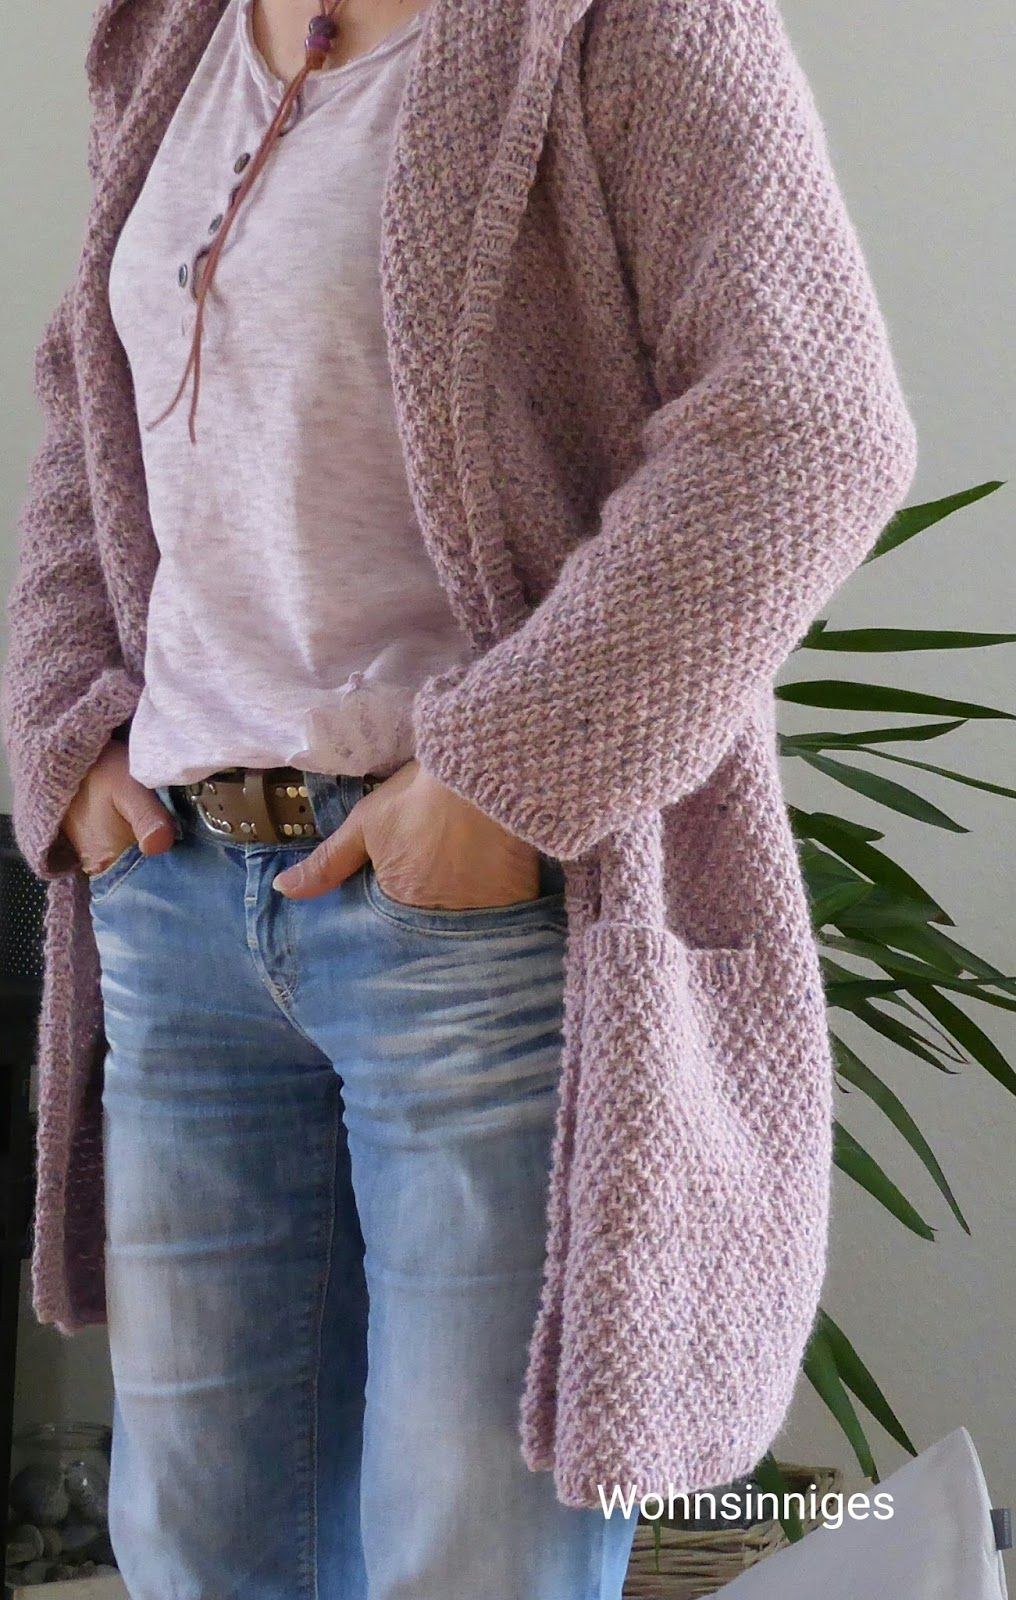 wohnblog blog diy do it yourself deko wohnen crochet knit pinterest and. Black Bedroom Furniture Sets. Home Design Ideas